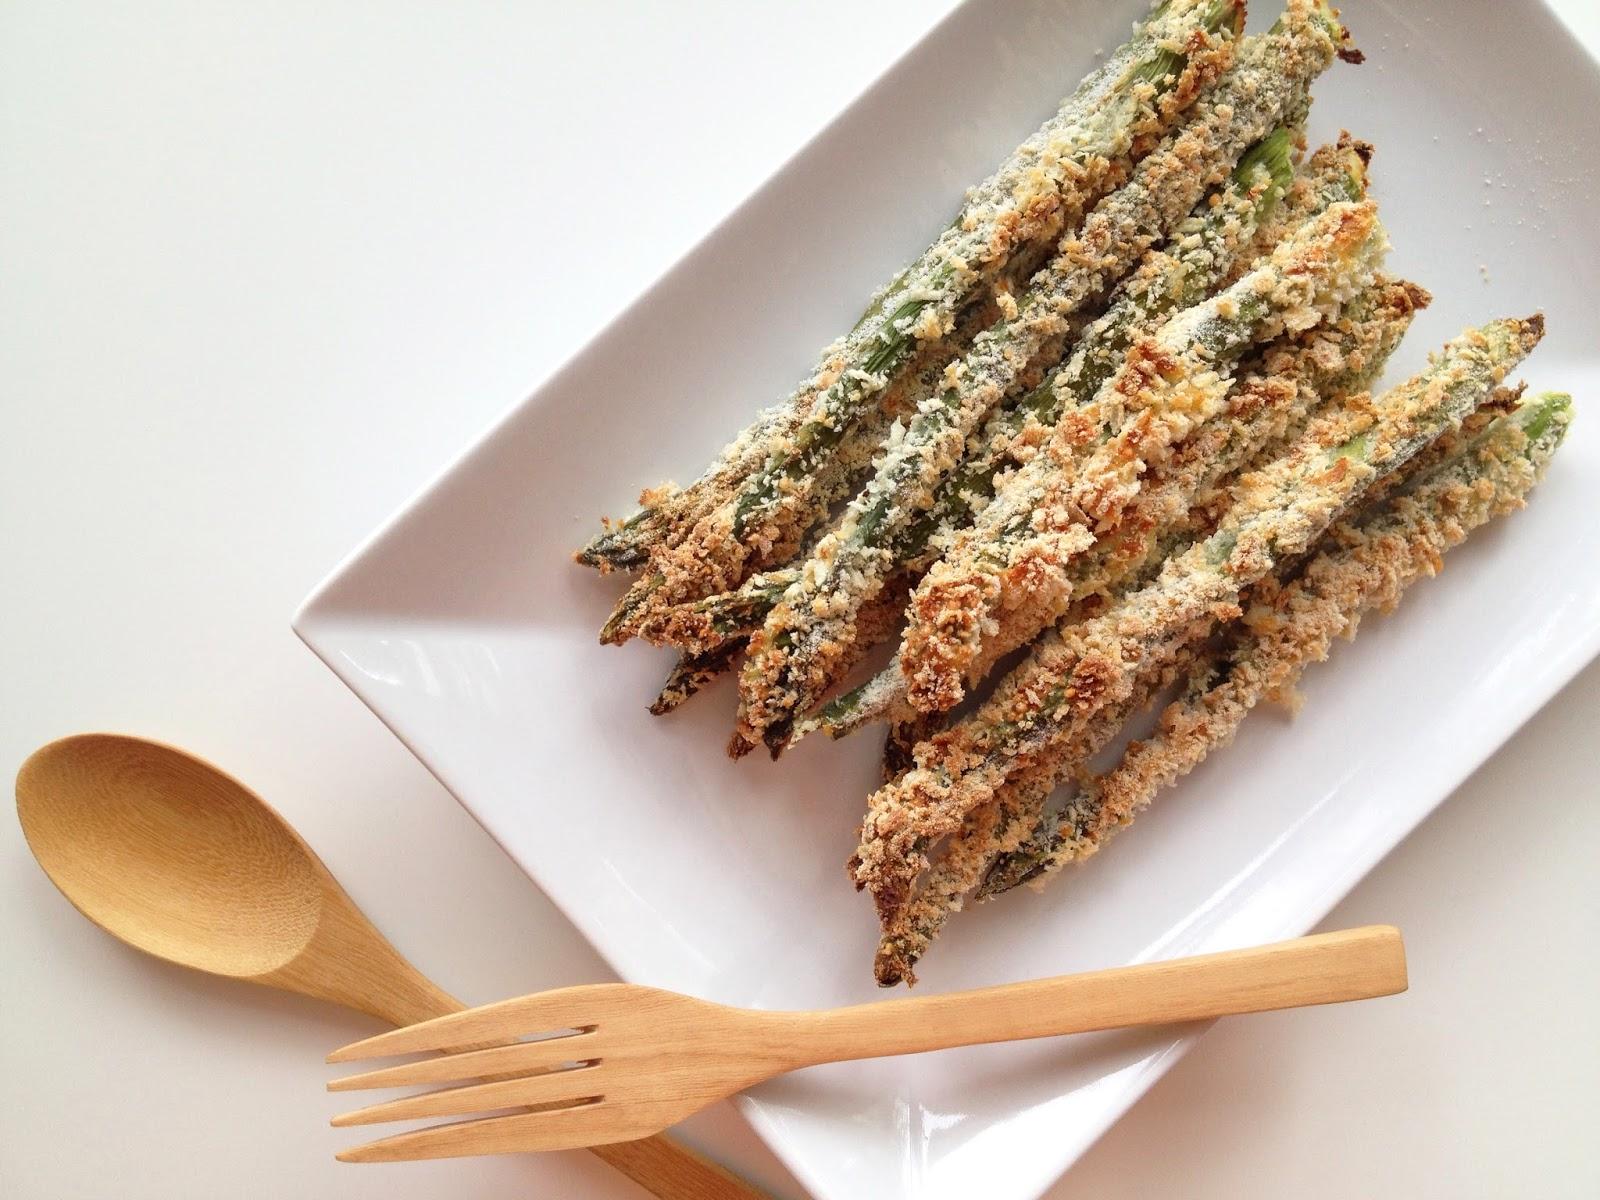 ... asparagus stalks in egg whites, dredge them through a panko parmesan